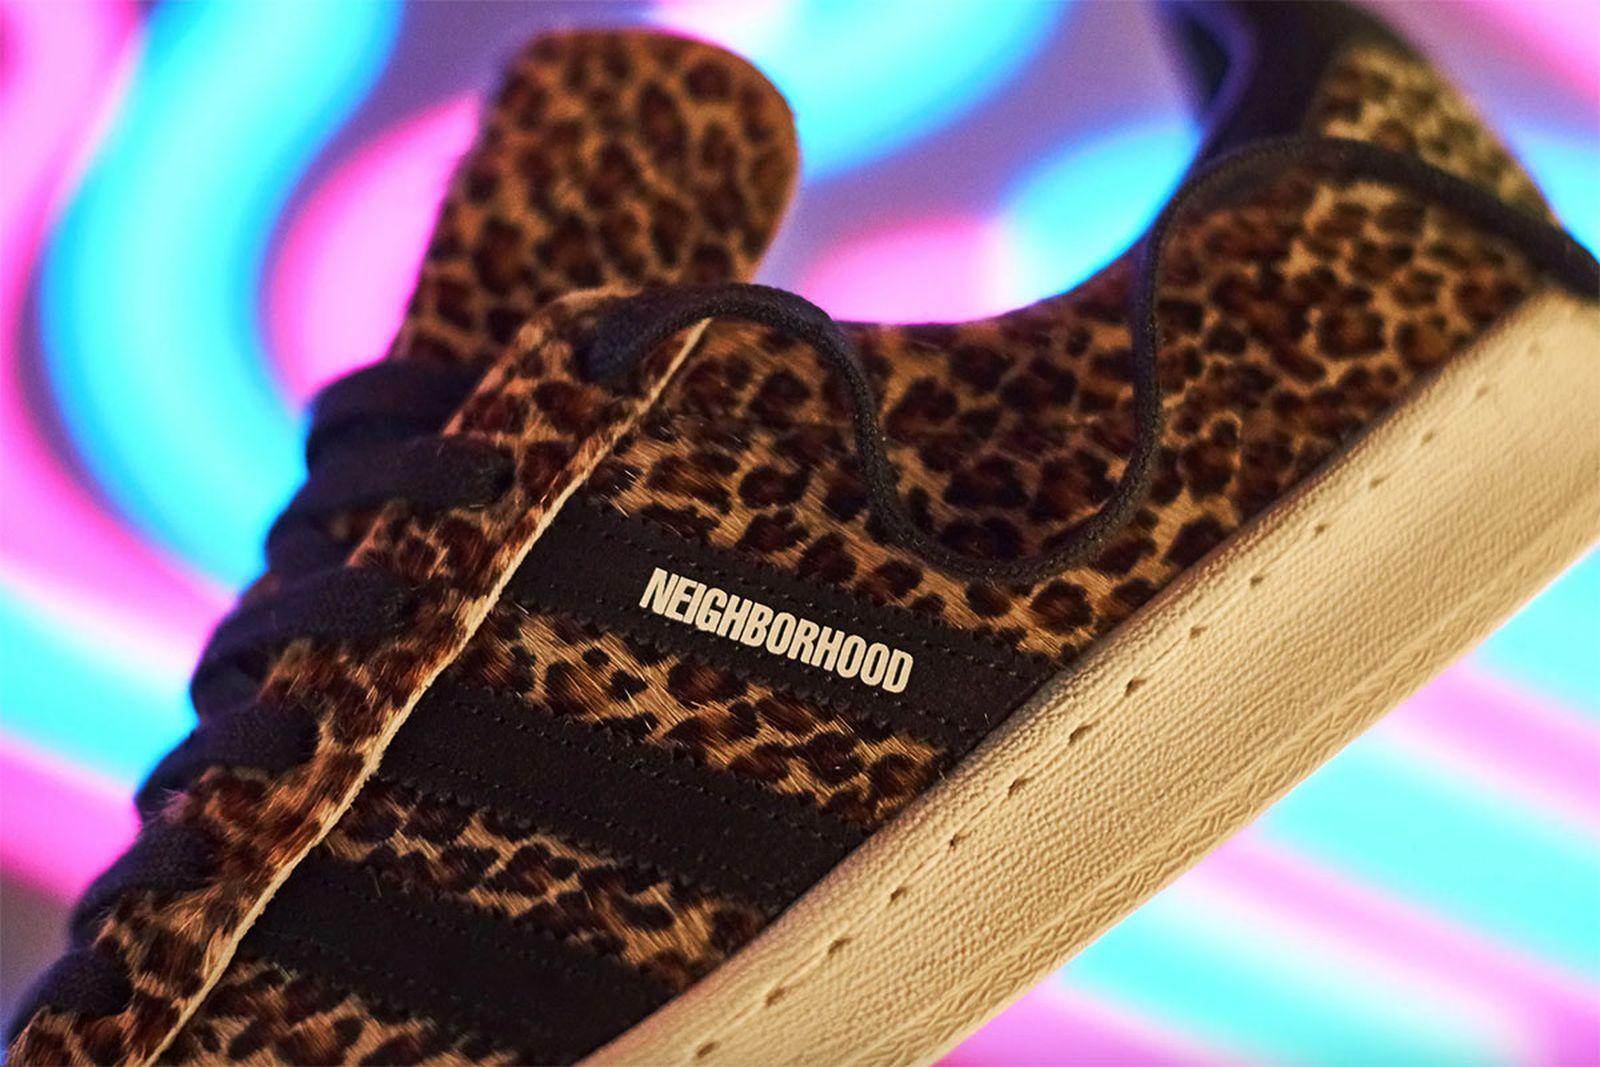 neighborhood-end-adidas-summer-2021-release-date-price-02